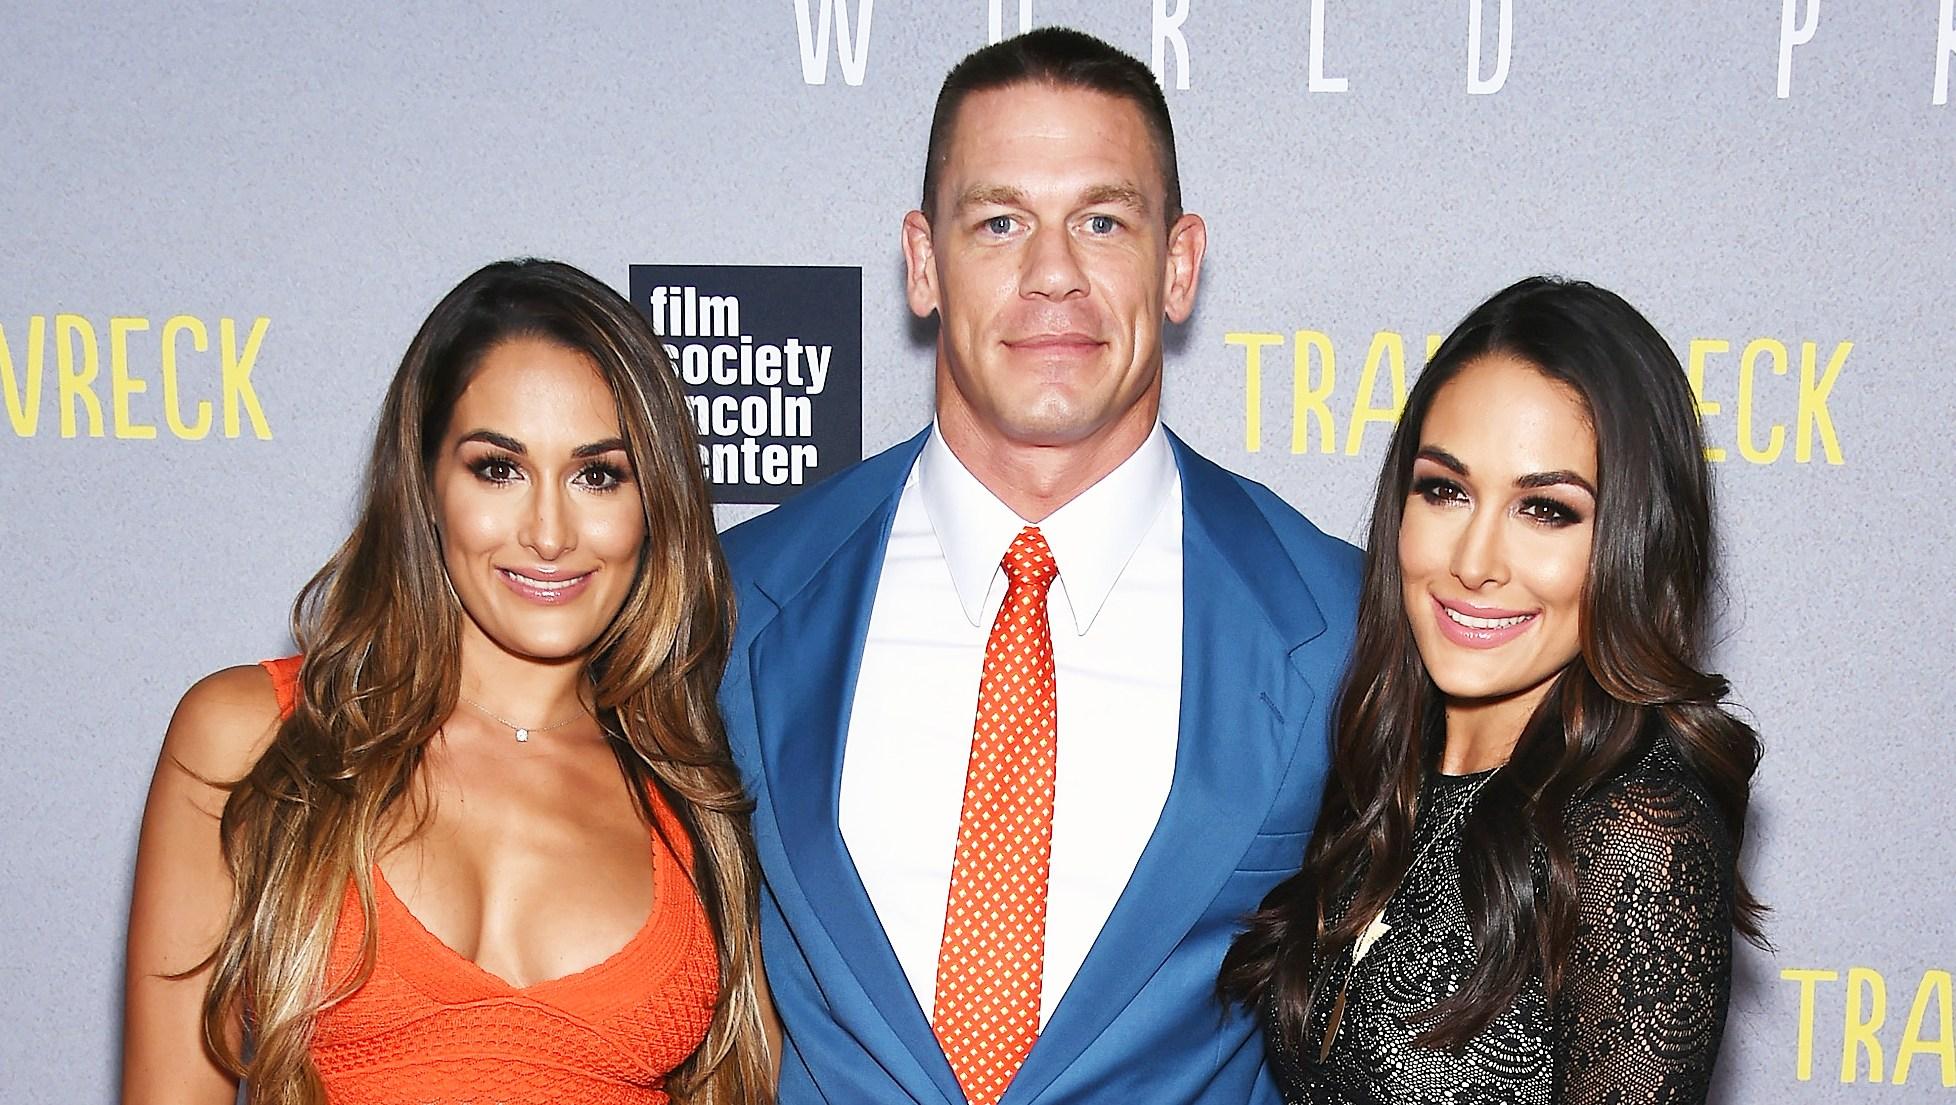 Brie Bella Breaks Silence on Nikki Bella John Cena Split